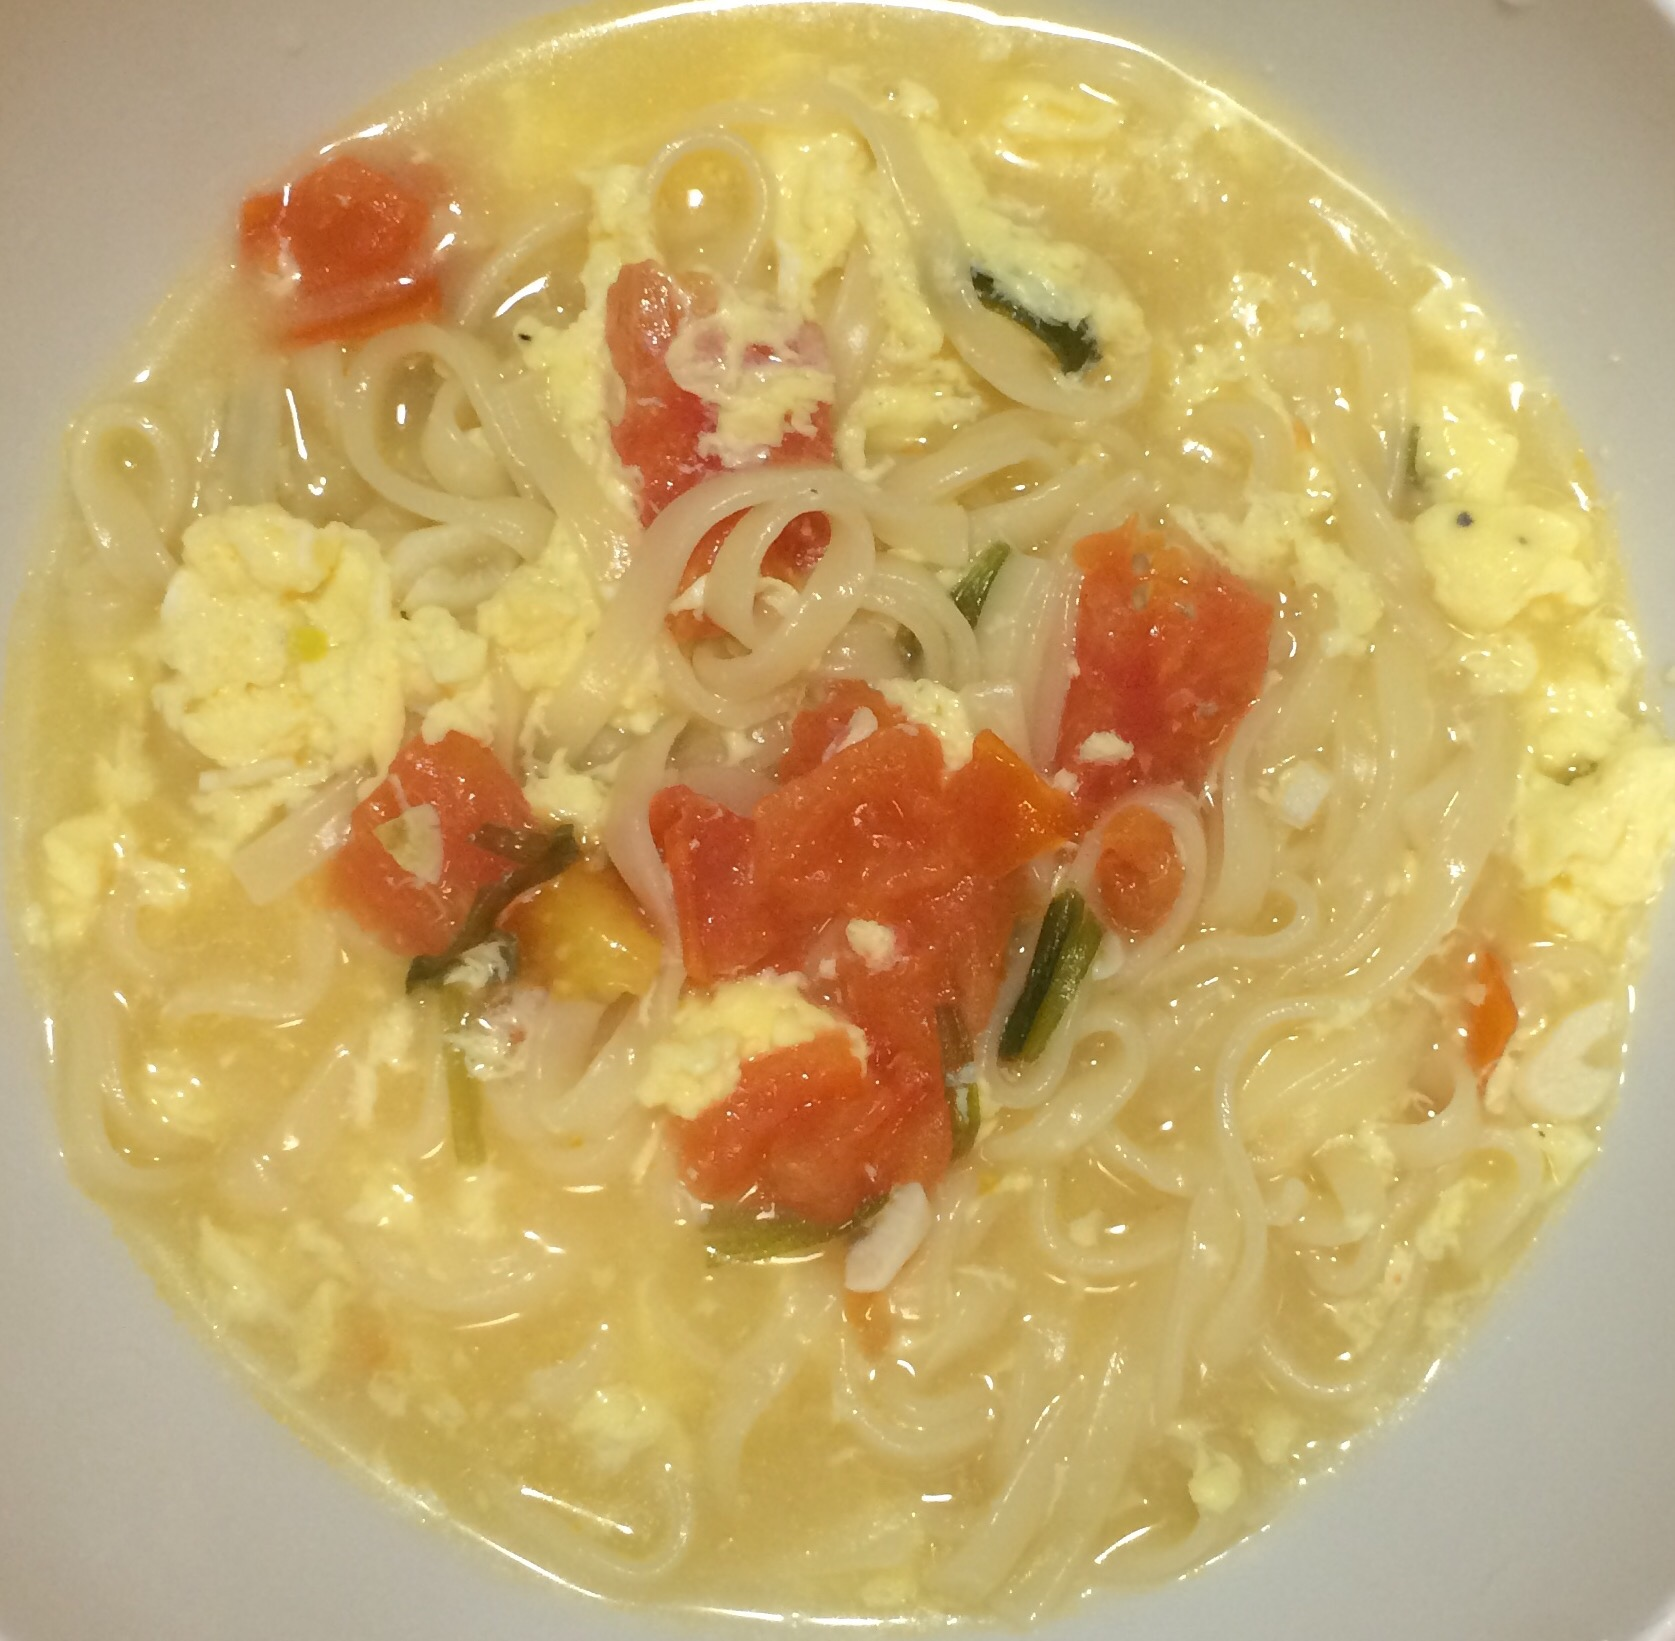 Asian noodles tomato broth soup photo